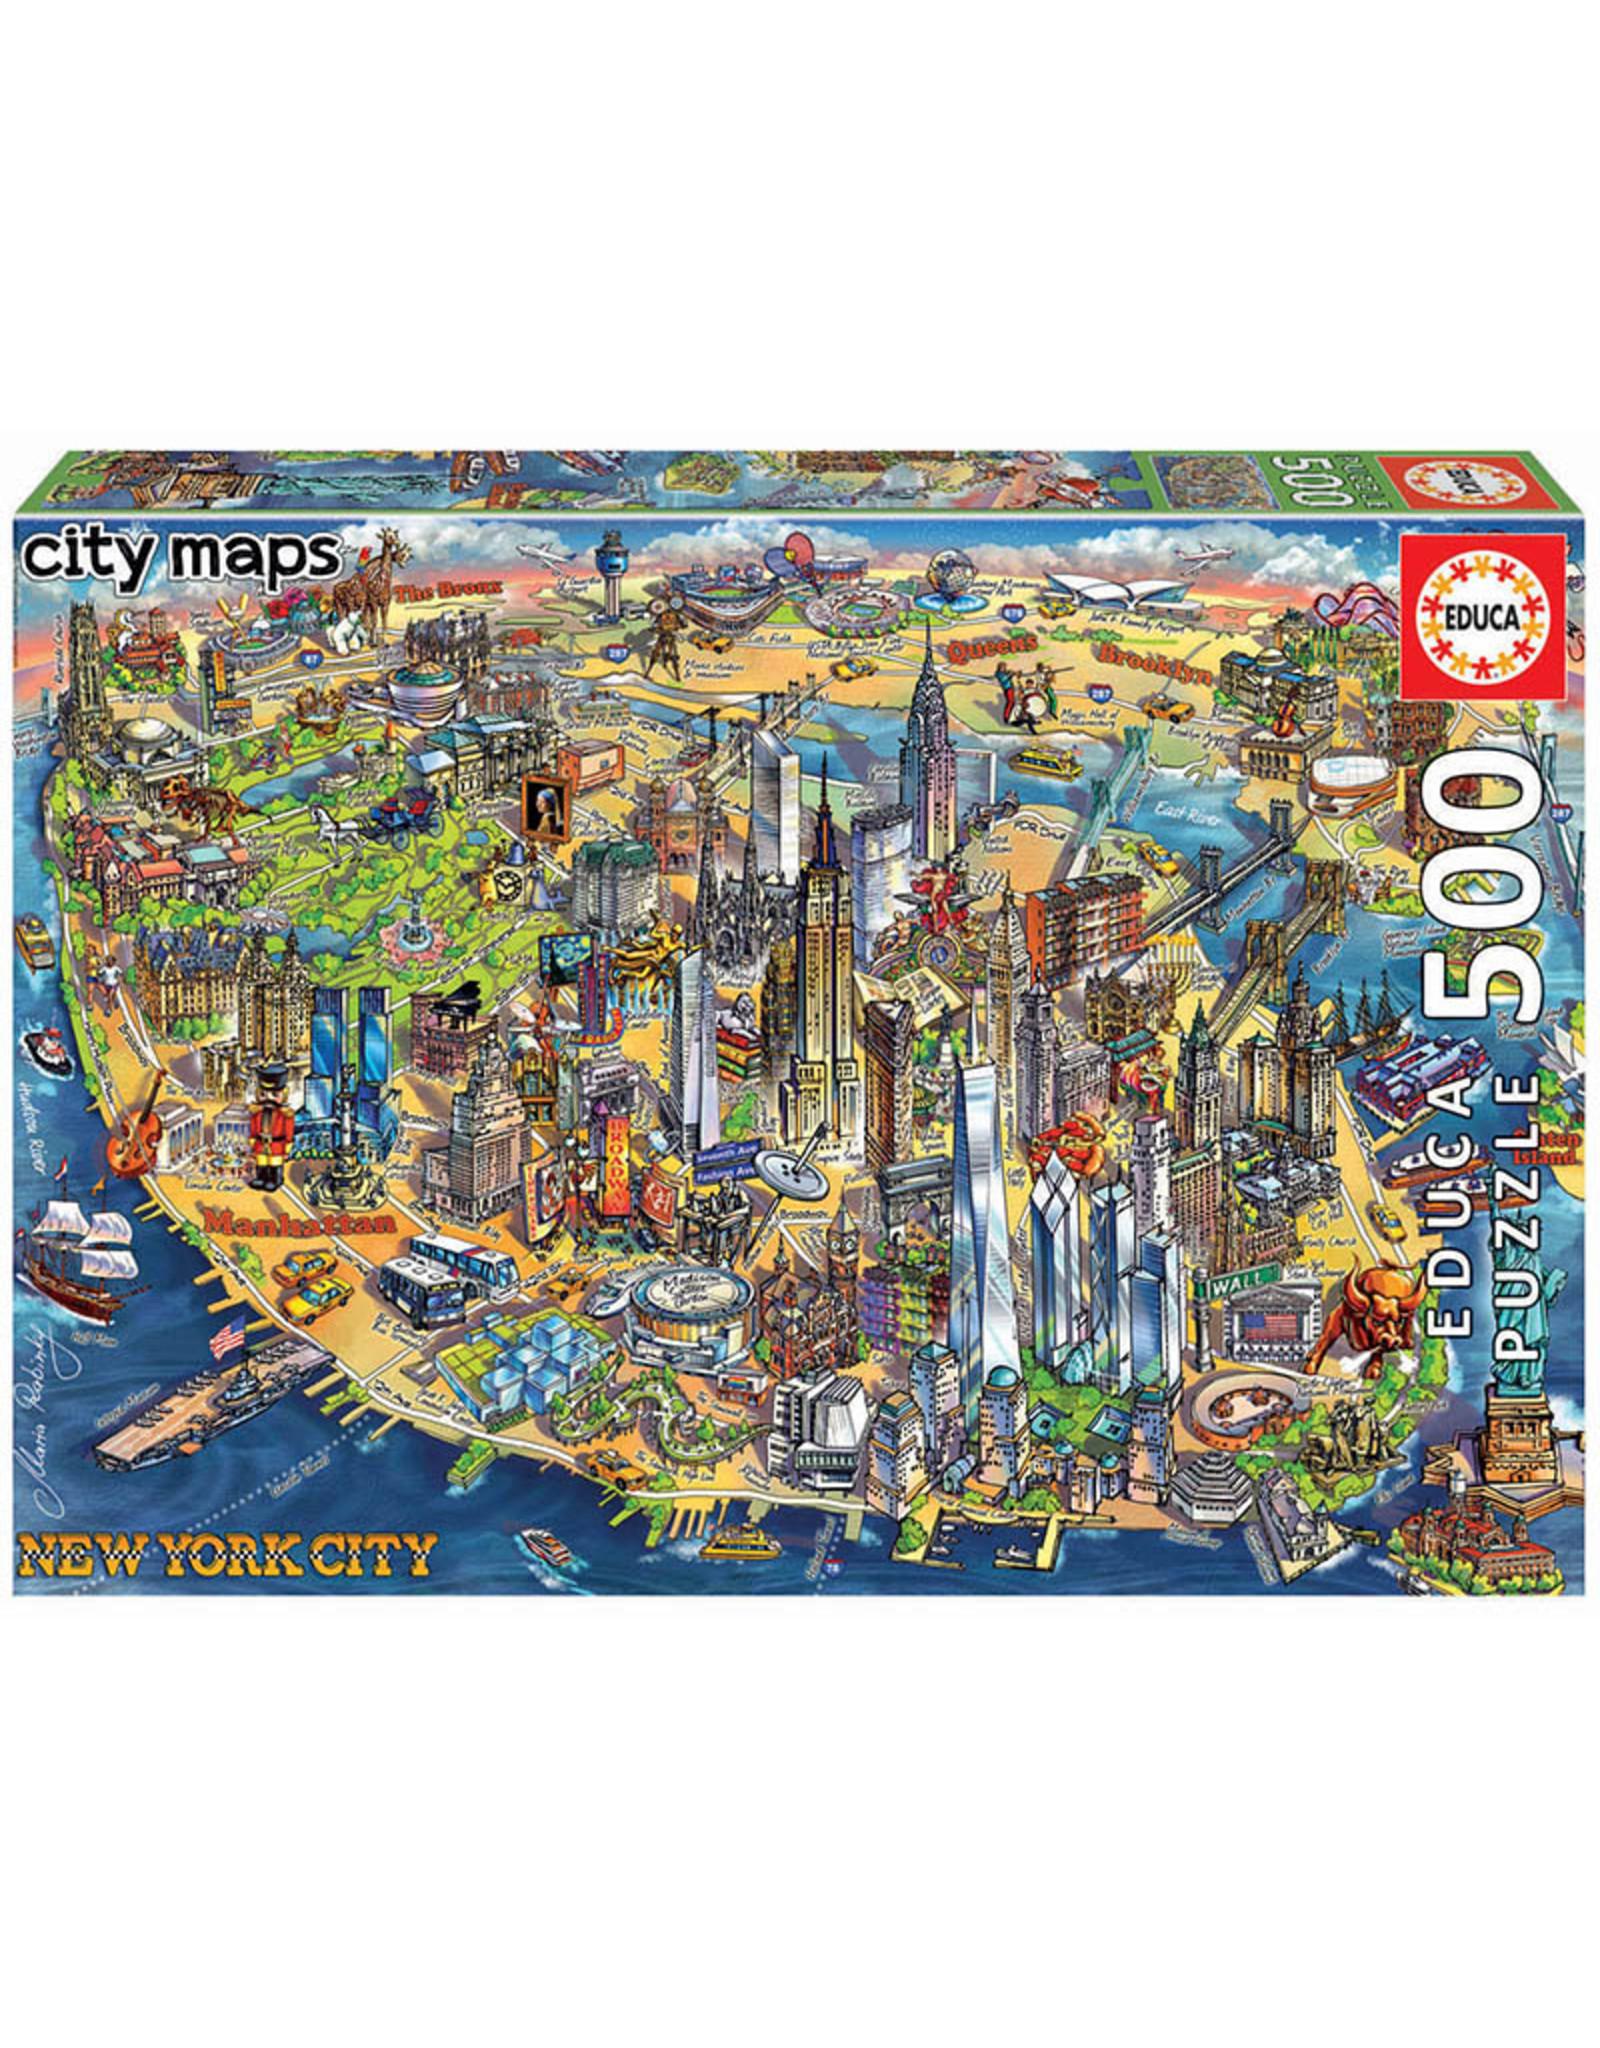 Educa New York City Map 500pc Puzzle